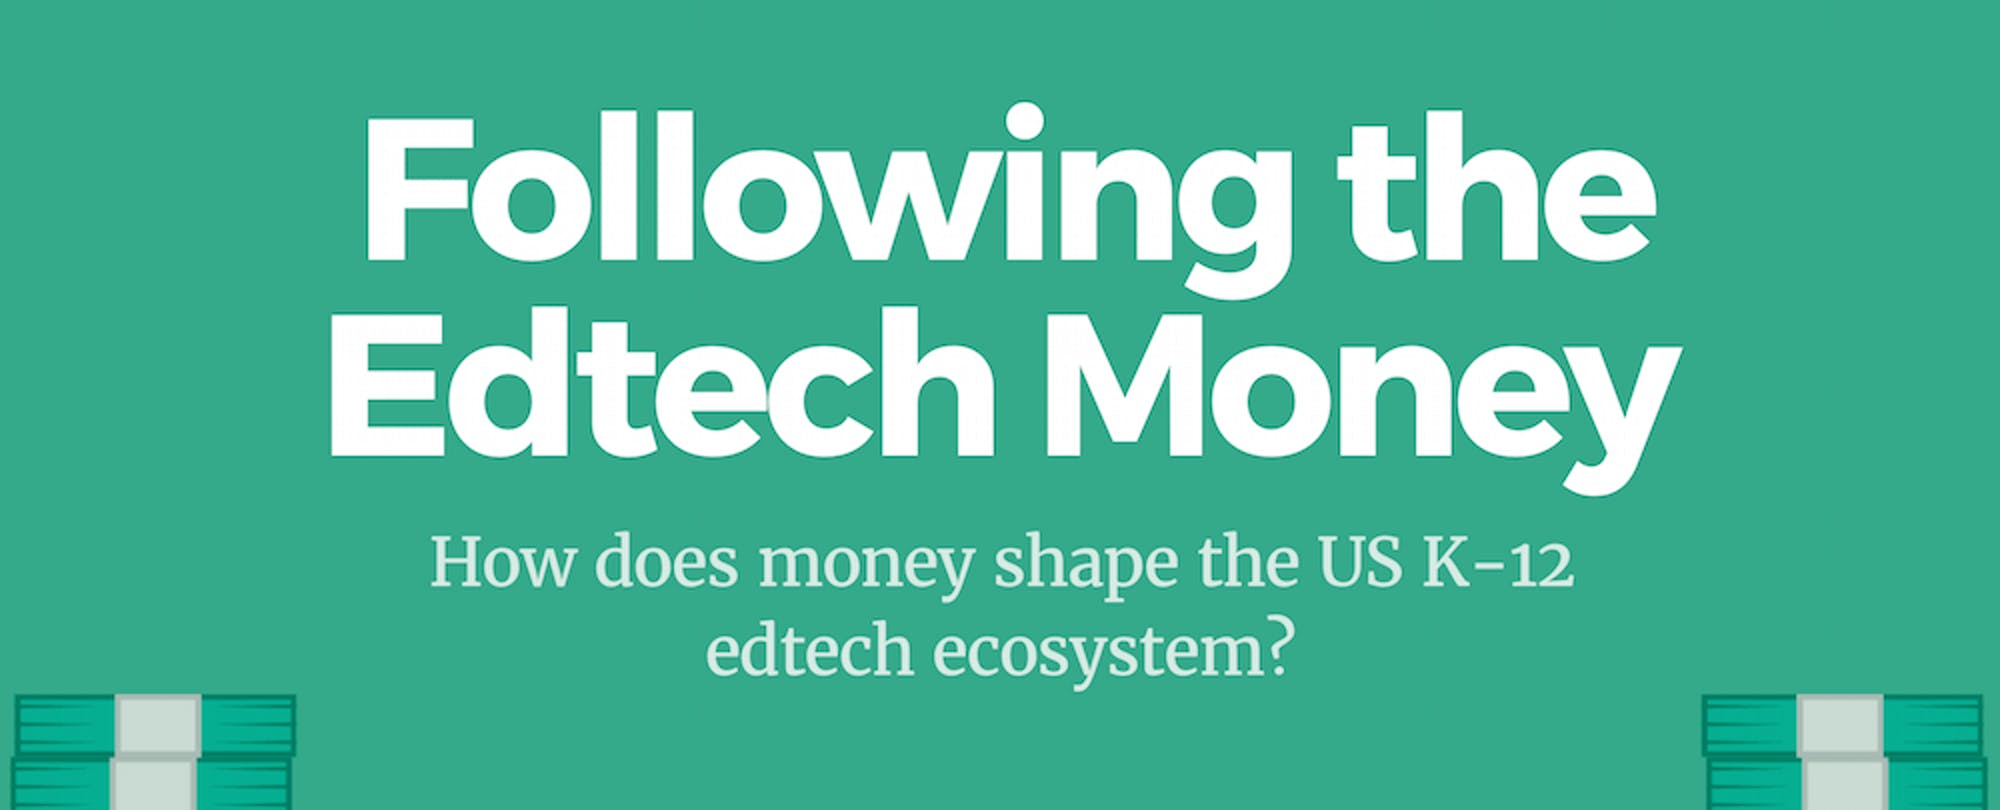 How Does Money Shape the US K-12 Ecosystem?